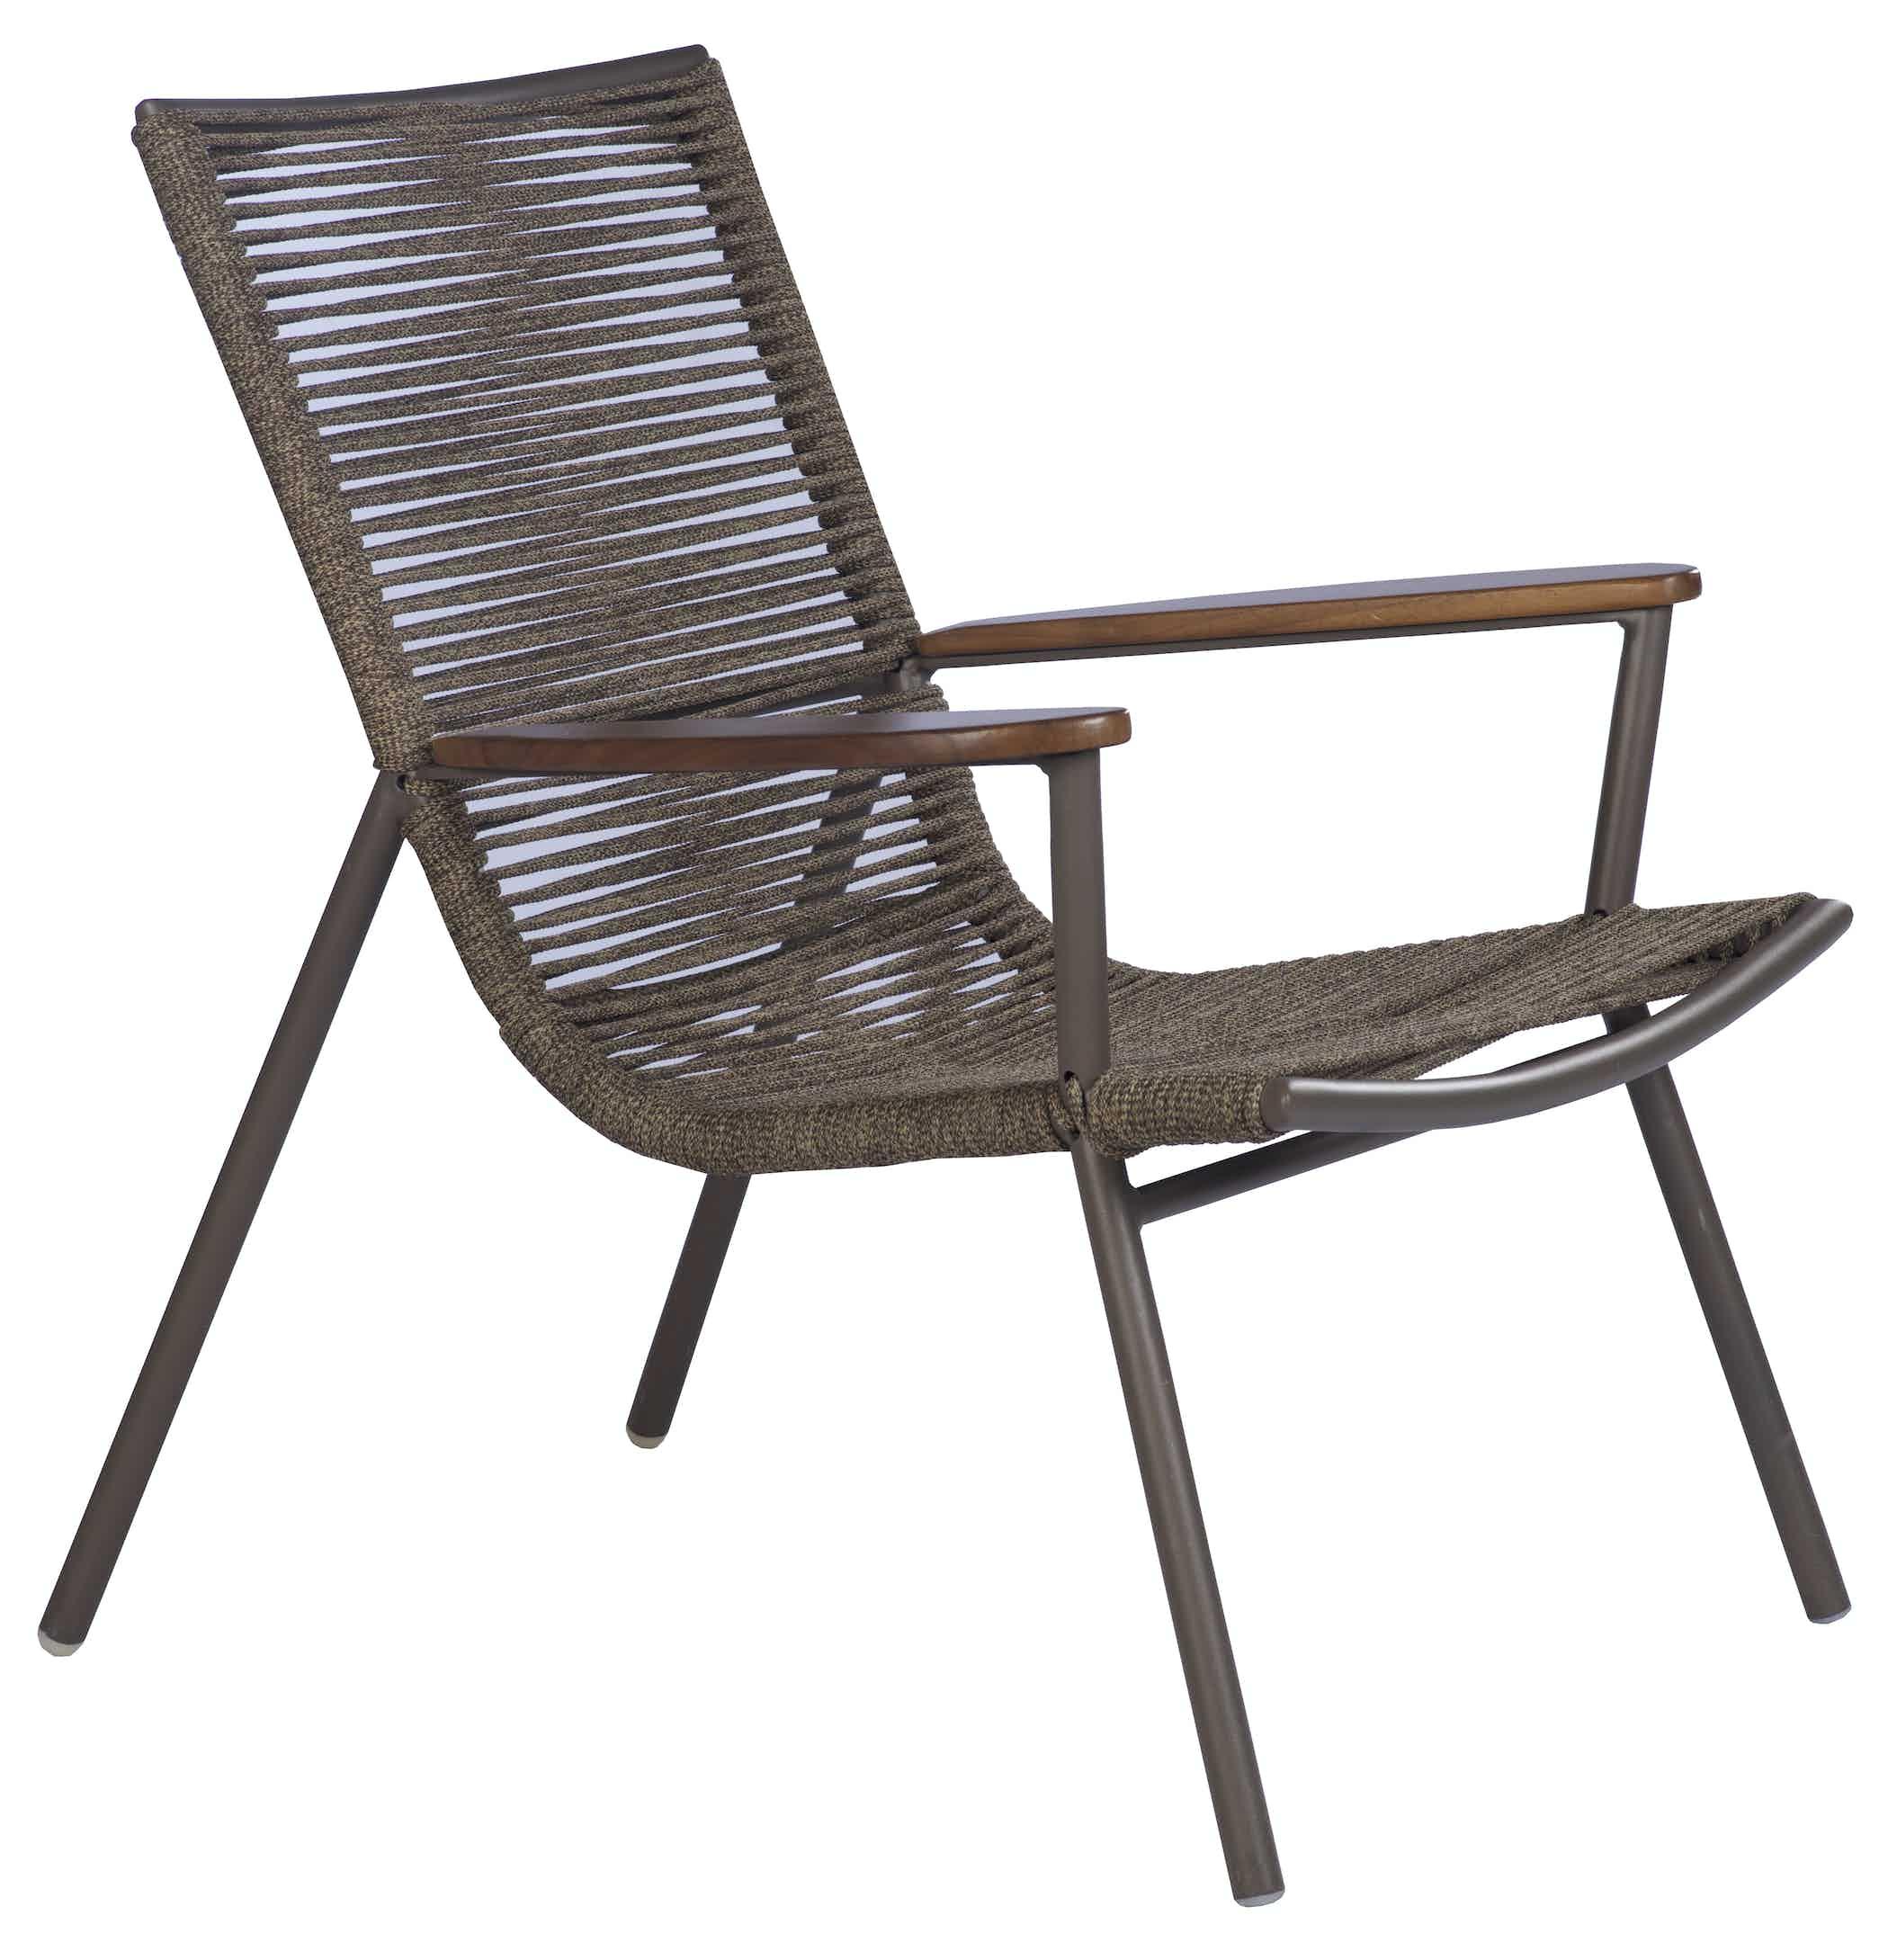 Tidelli amado lounge chair brown angle haute living